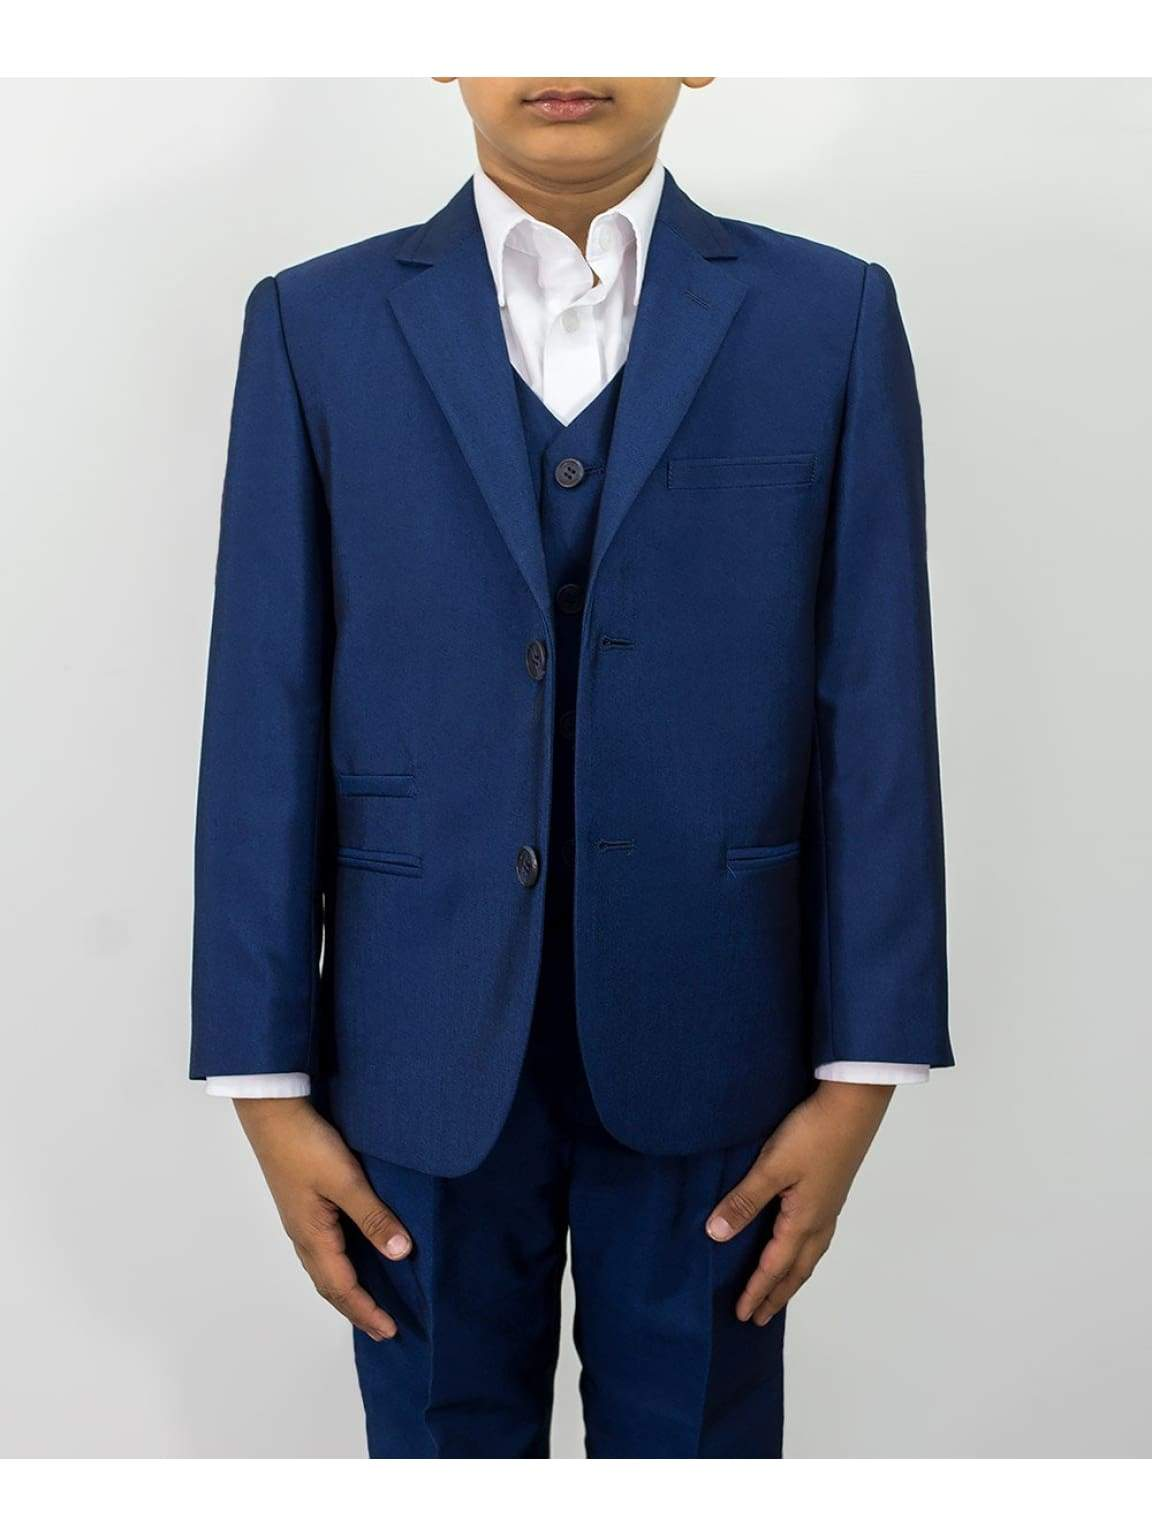 Cavani Ford Boys Three Piece Royal Blue Slim Fit Suit - Suit & Tailoring